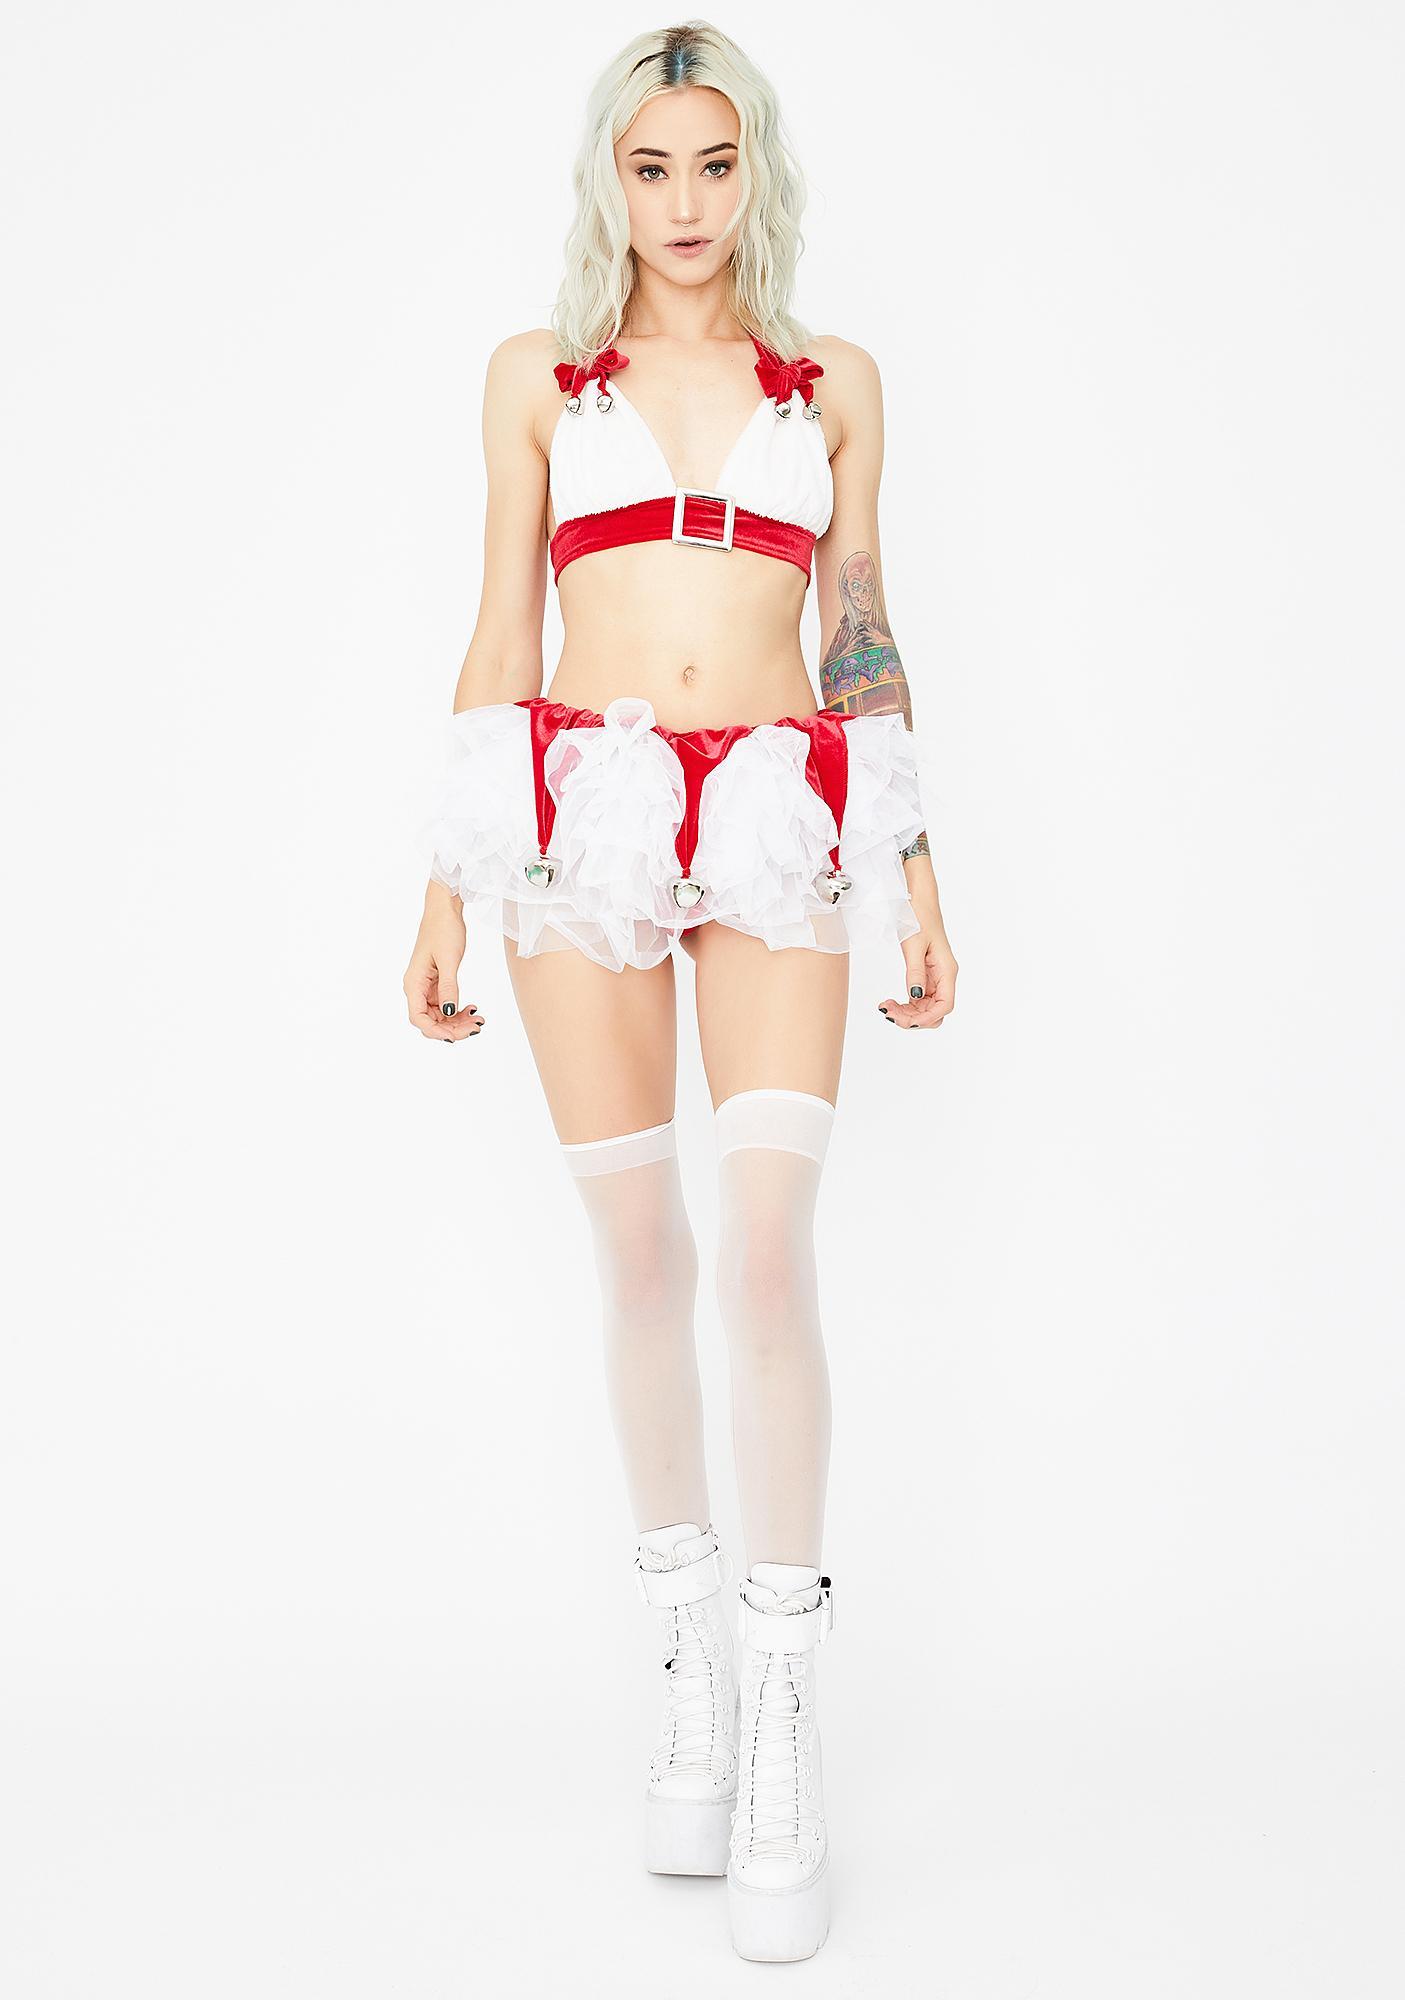 J Valentine Jingle Bell Skirt Set